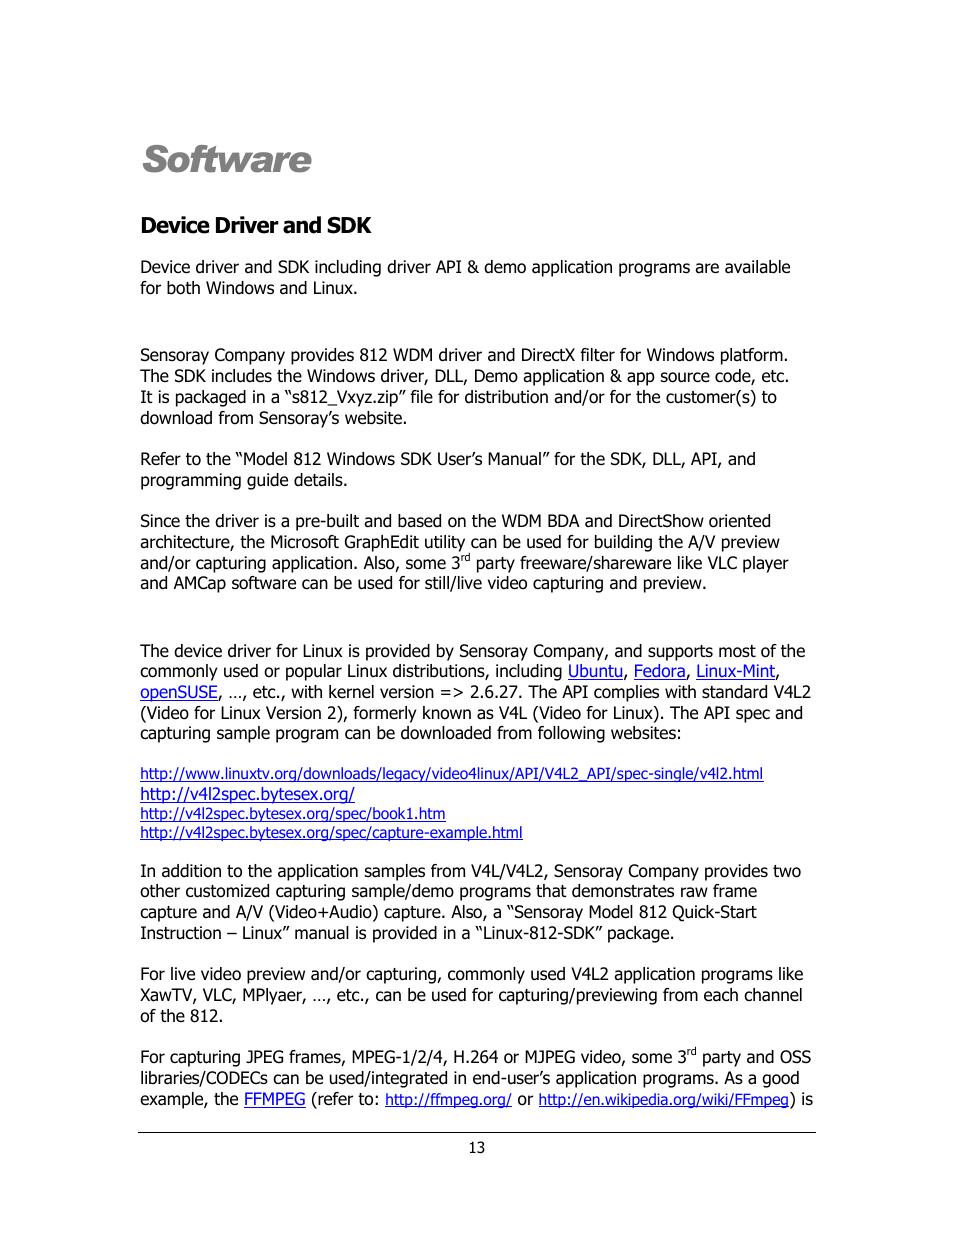 Software, Device driver and sdk, Windows   Sensoray 812 User Manual ...